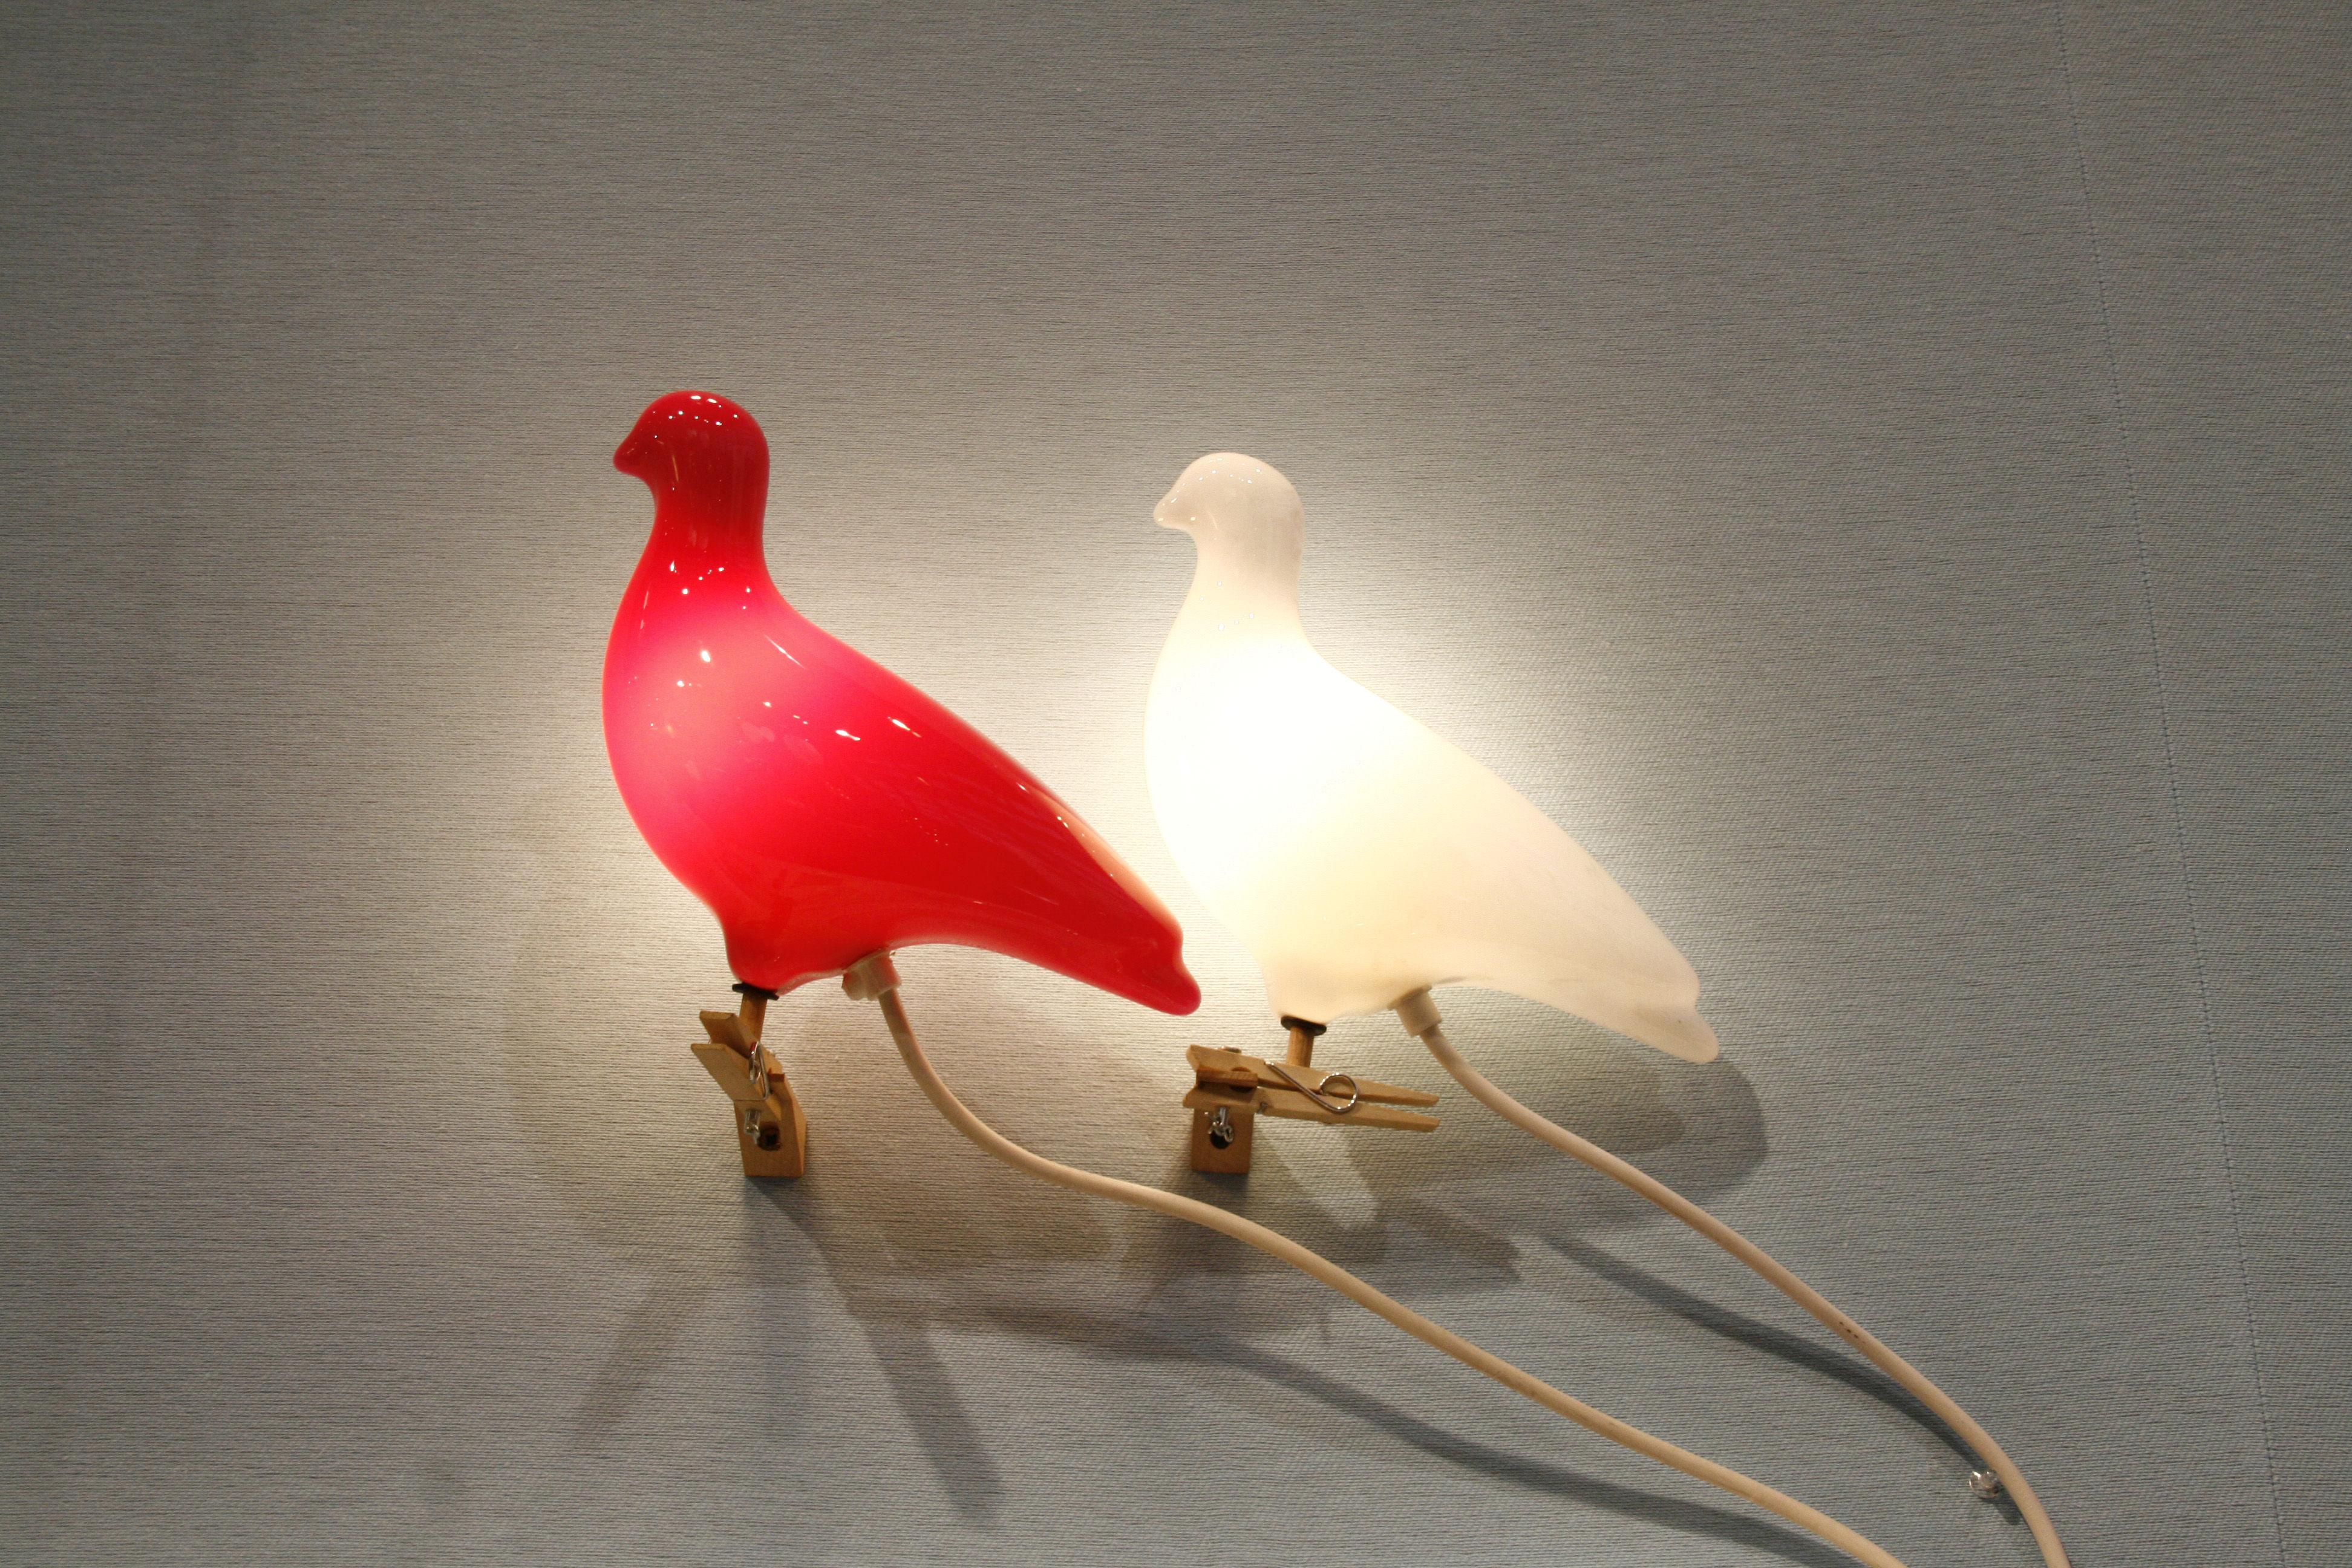 lampe pigeon clipser ou fixer au mur orange c ble blanc thorsten van elten pop corn. Black Bedroom Furniture Sets. Home Design Ideas